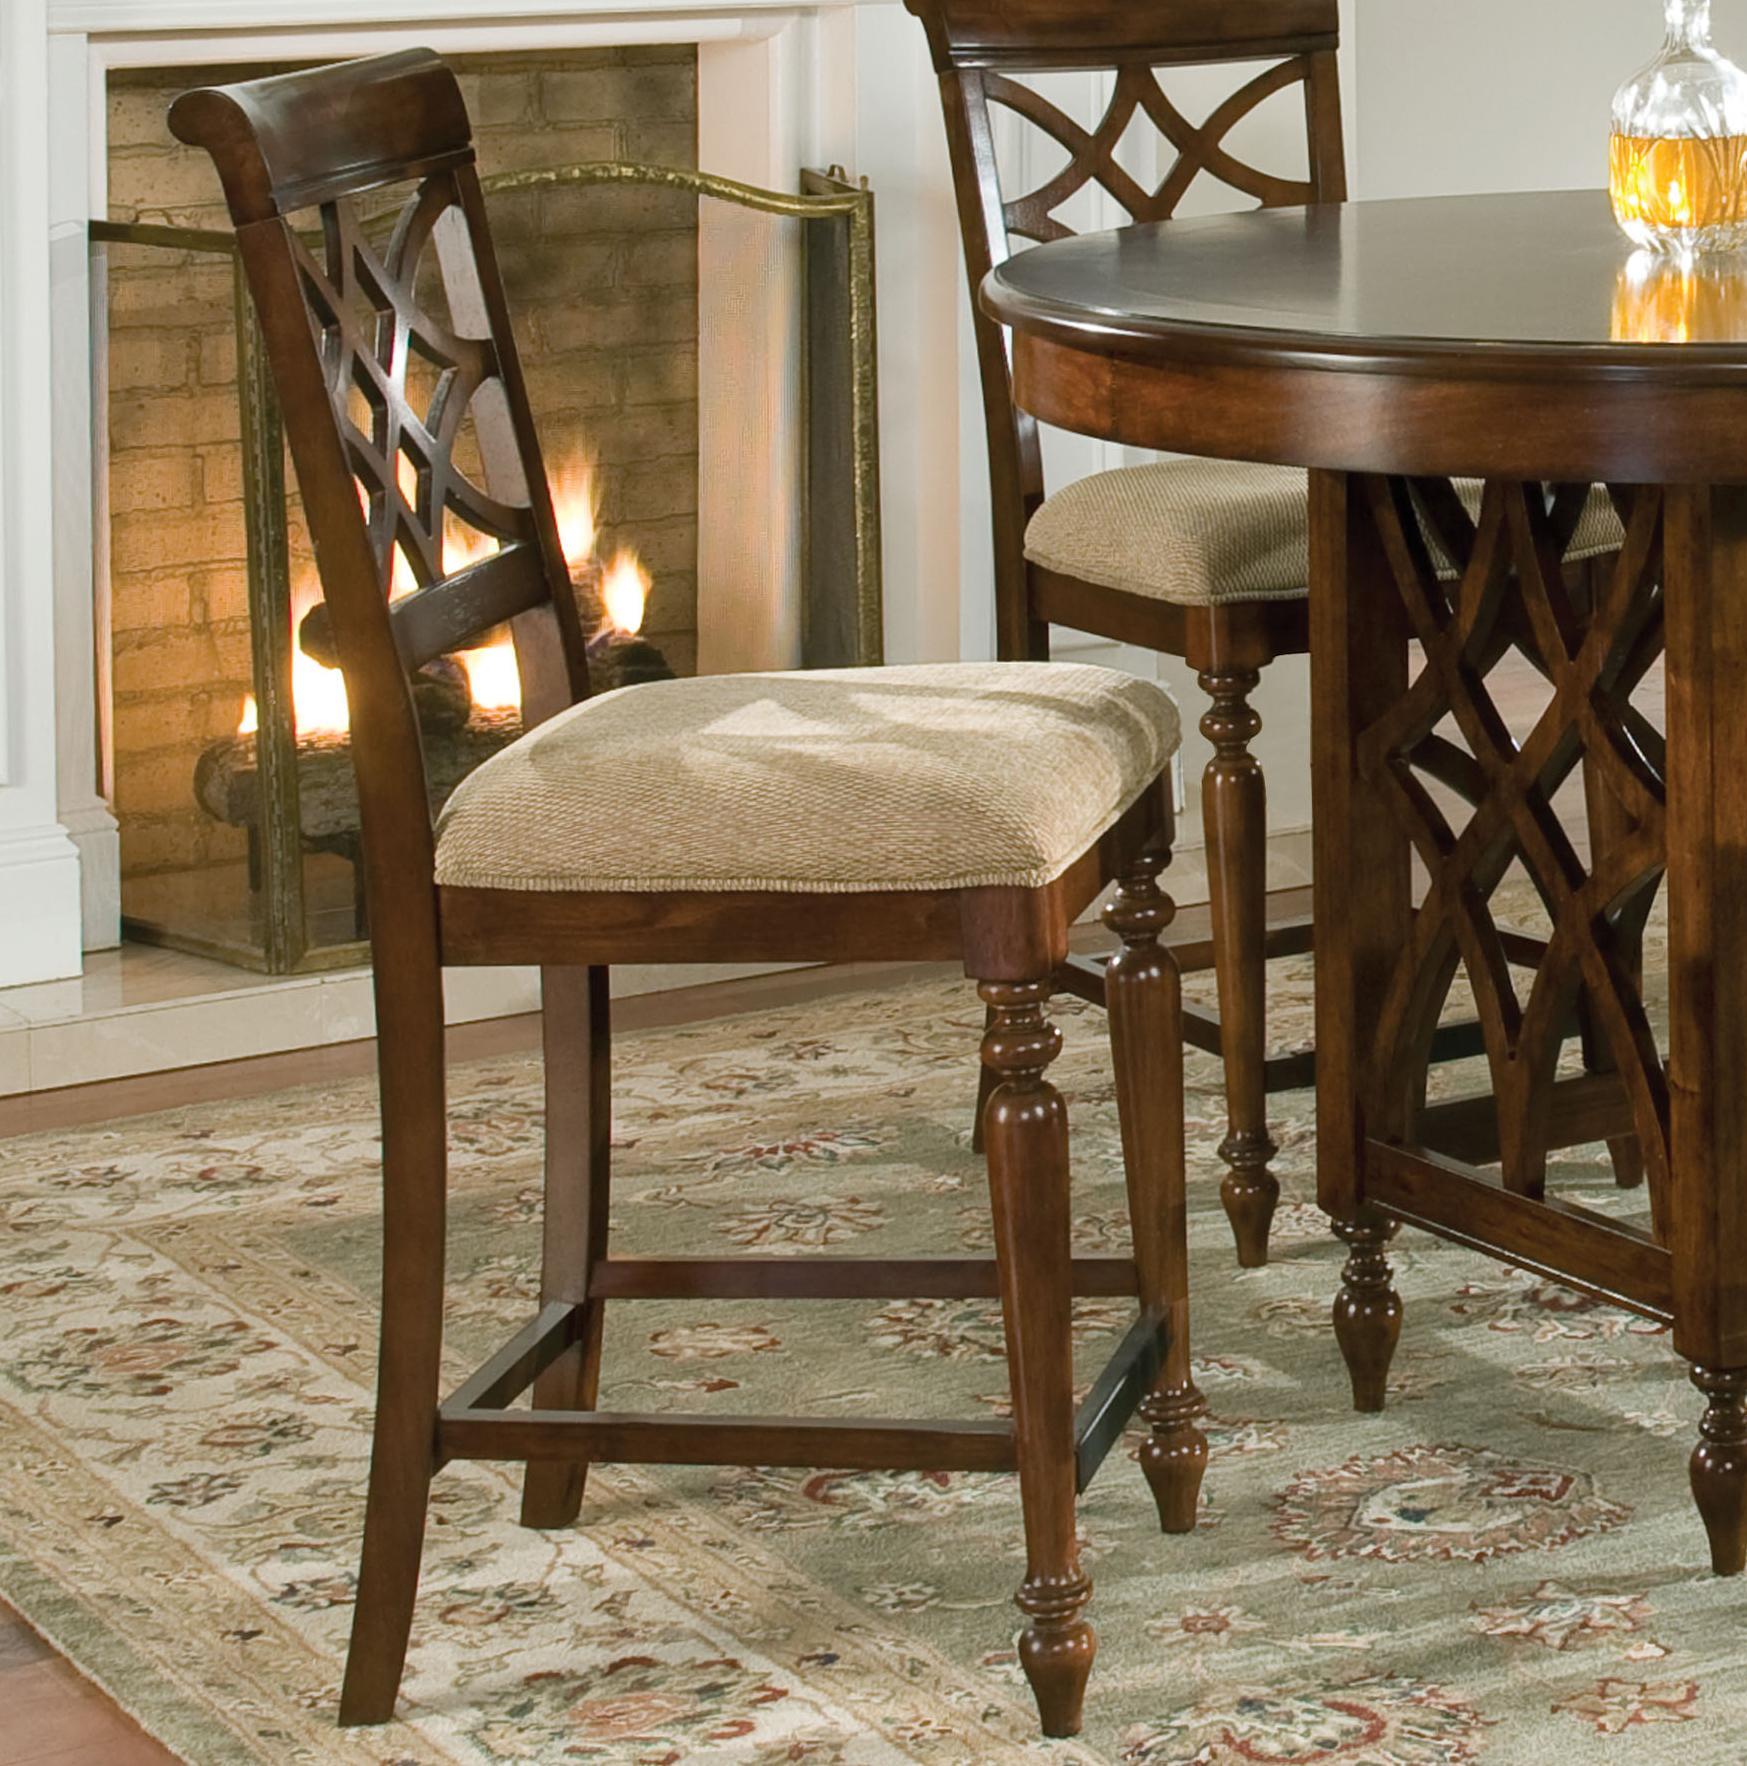 standard furniture woodmont 5 piece counter height table upholstered stools set miskelly. Black Bedroom Furniture Sets. Home Design Ideas